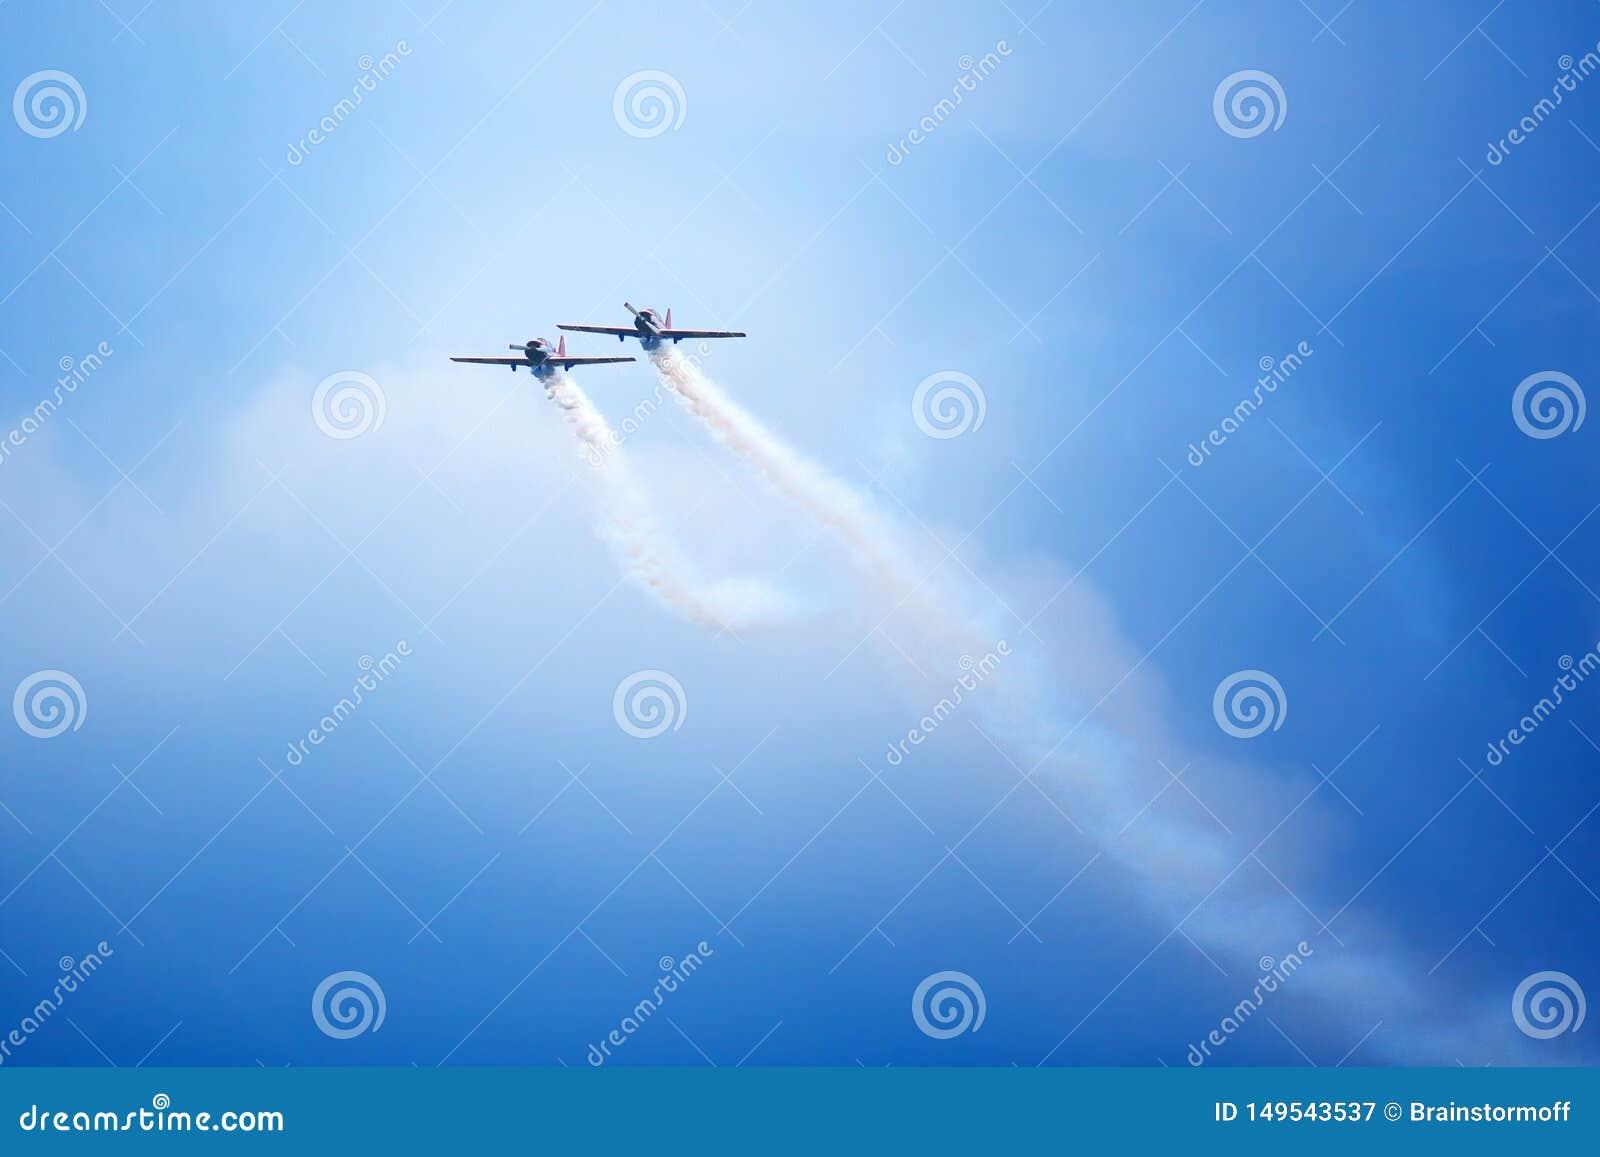 Aeródromo de Mochishche, festival aéreo local, dois Yak-52 que voam junto, equipe aerobatic 'céu aberto ', Barnaul